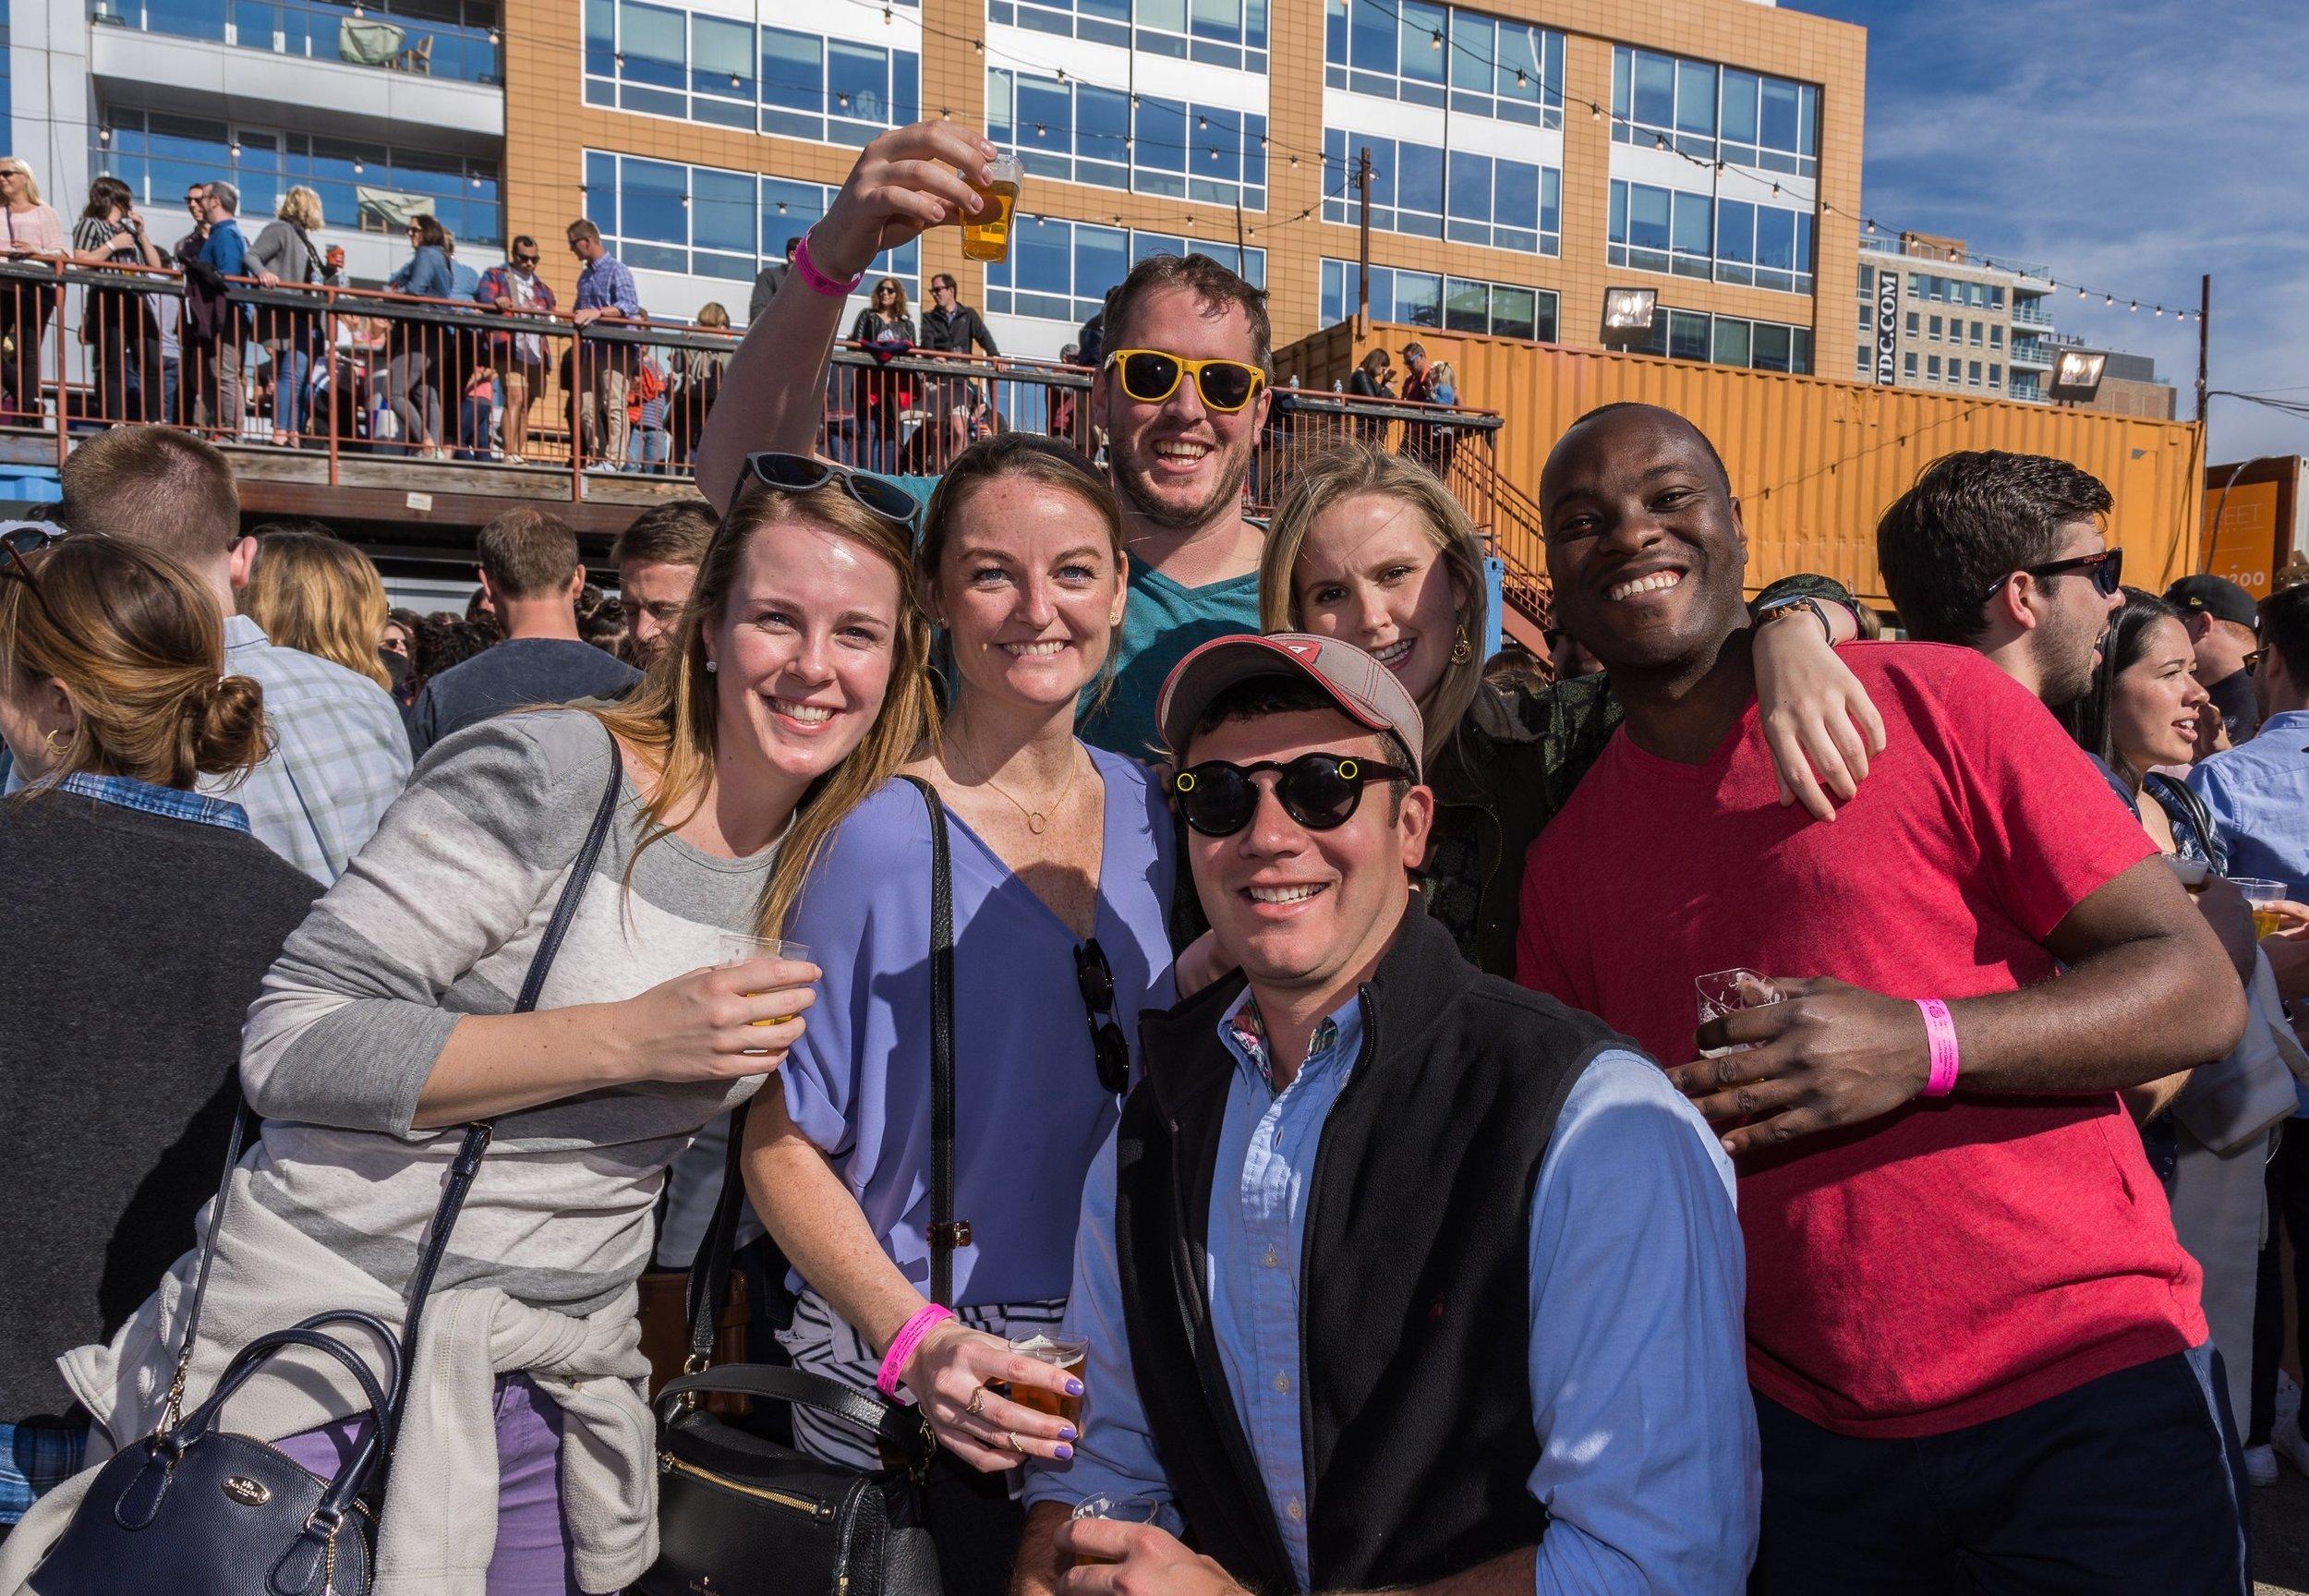 Capital-Brewfest-Blossom-Bash-2017-54.jpeg